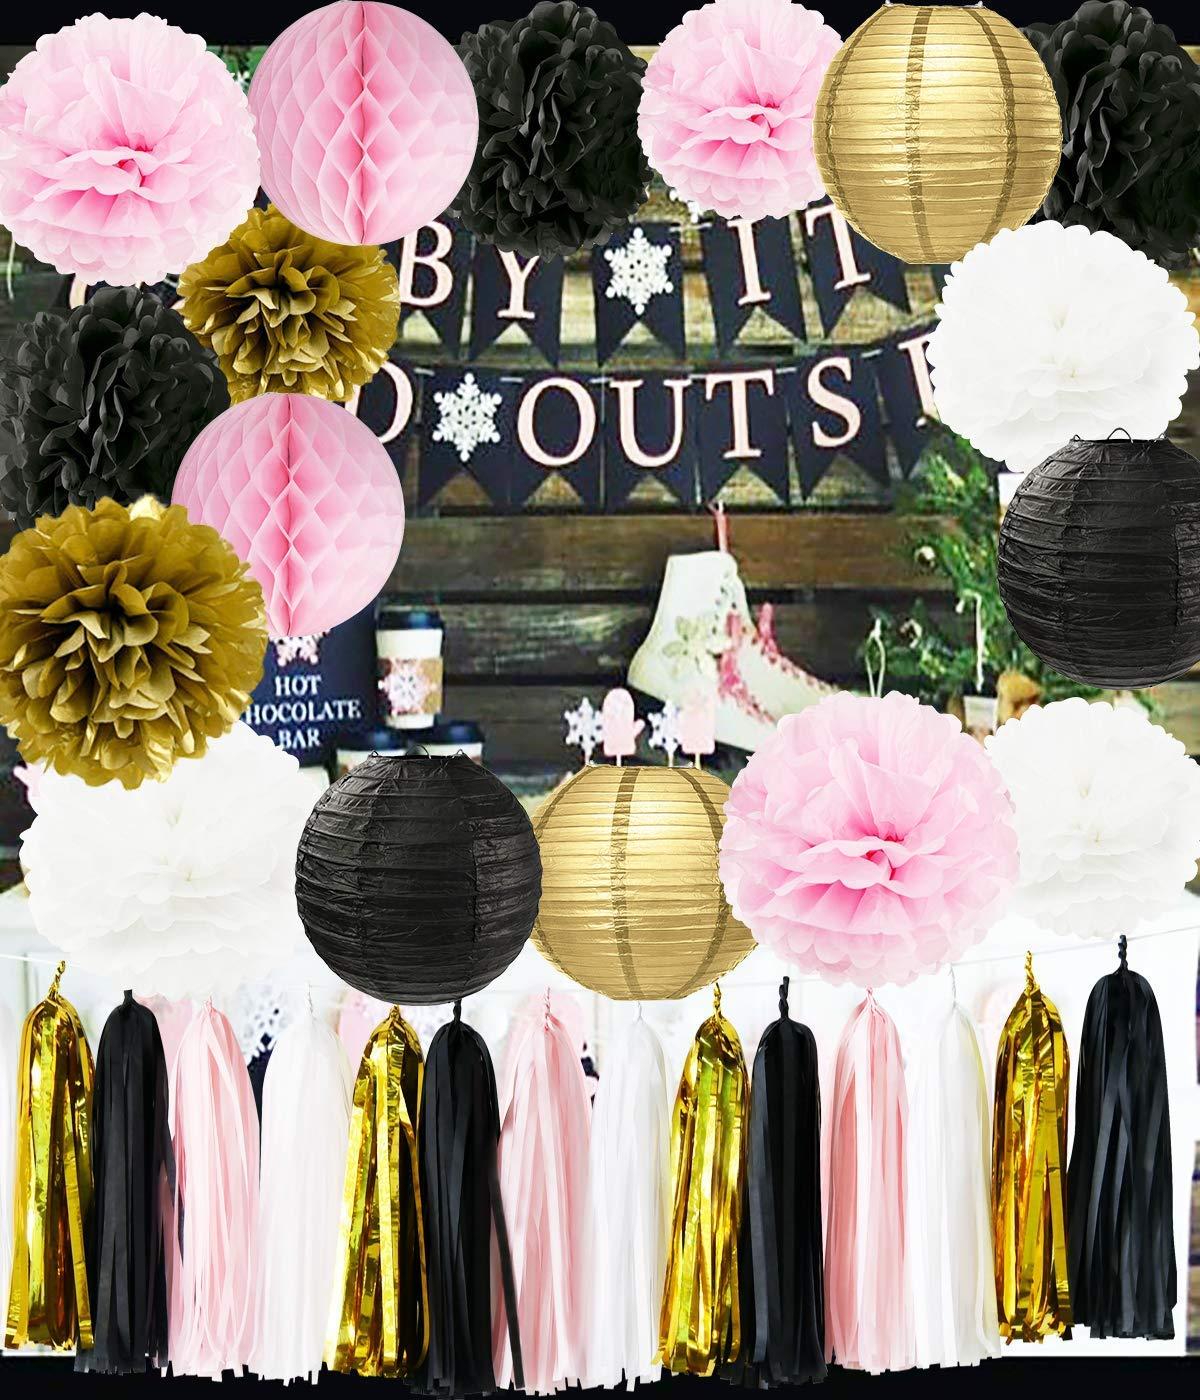 Amazoncom Ooh La La Baby Shower Decorations Pink Gold White Black